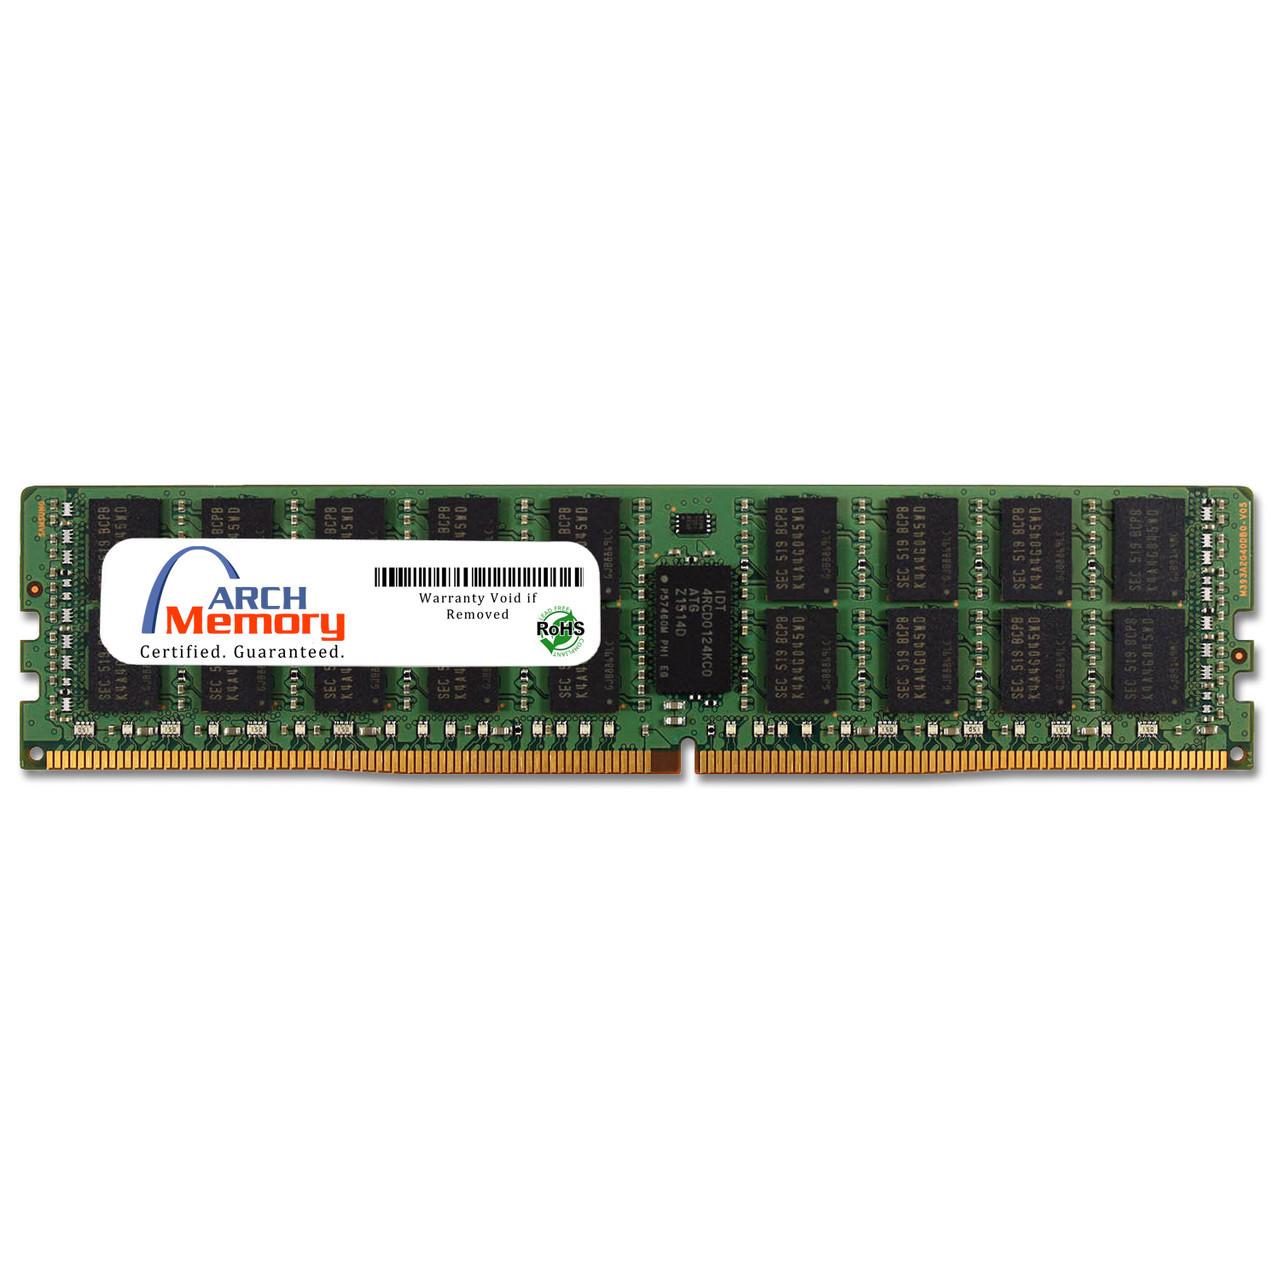 Cisco UCS-MR-X64G2RW 64 GB 288-Pin DDR4 3200 MHz RDIMM RAM